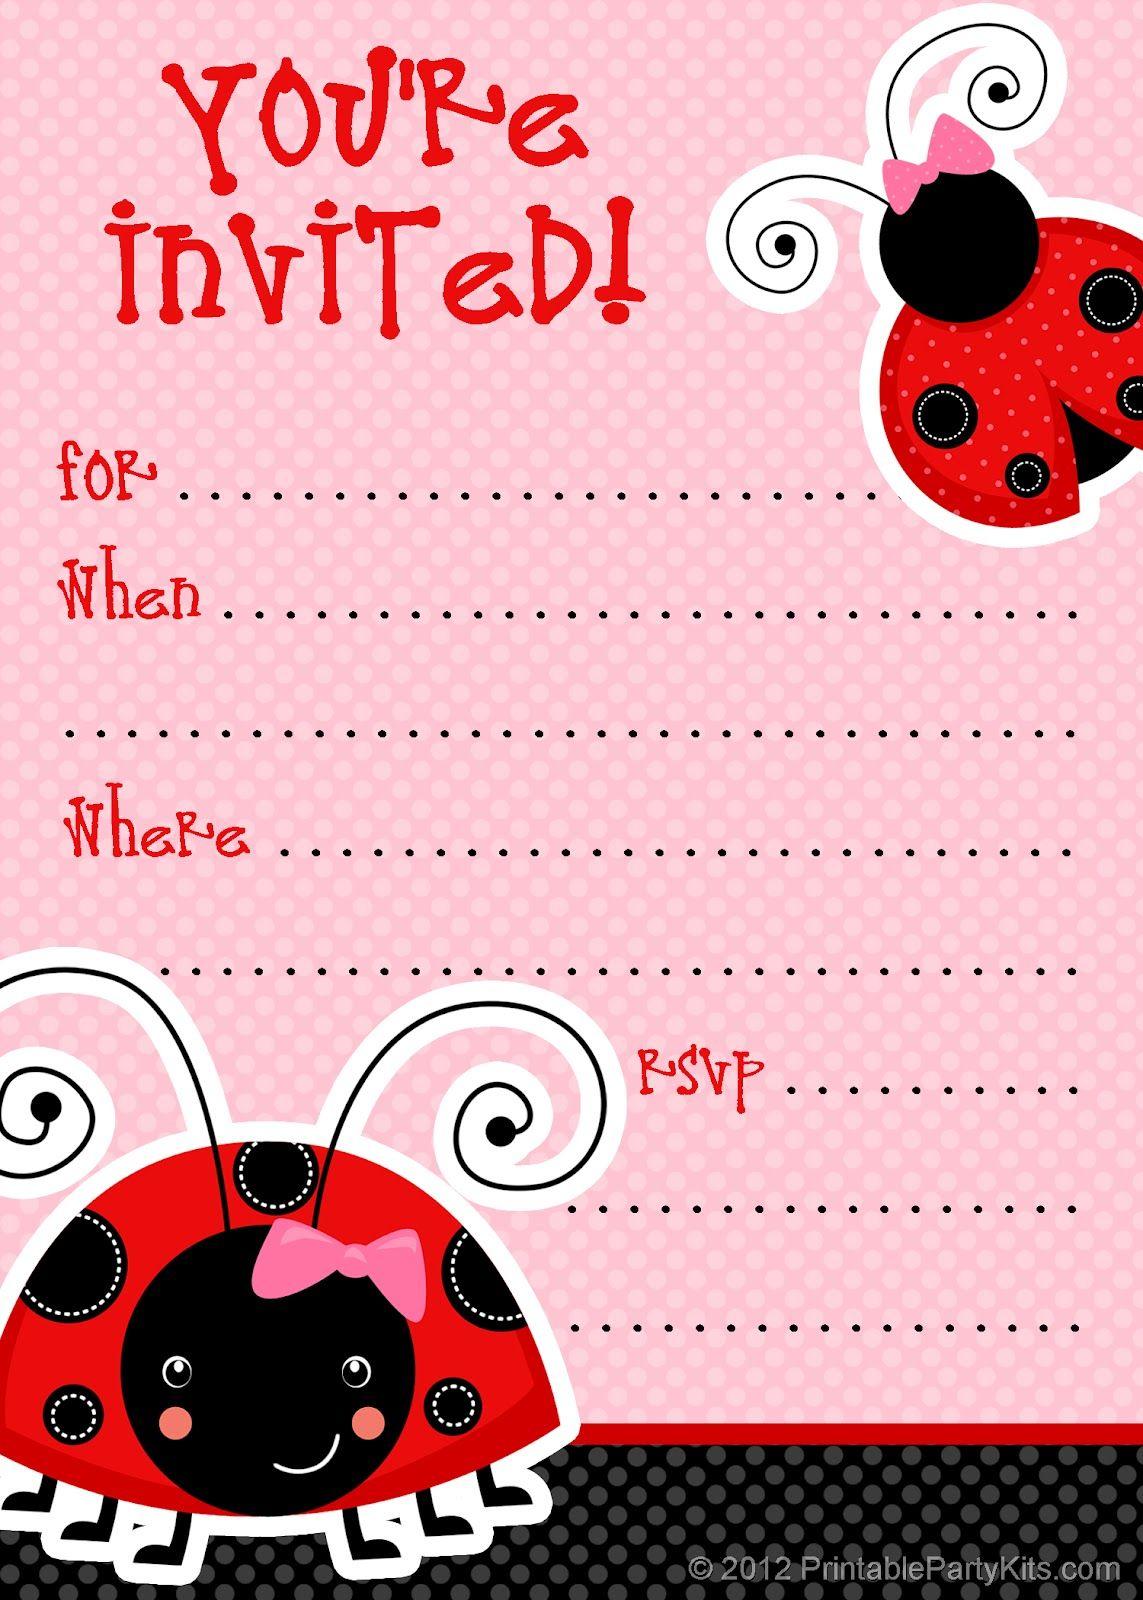 Free Printable Party Invitations: Free Ladybug Invite Template - Free Printable Ladybug Invitations